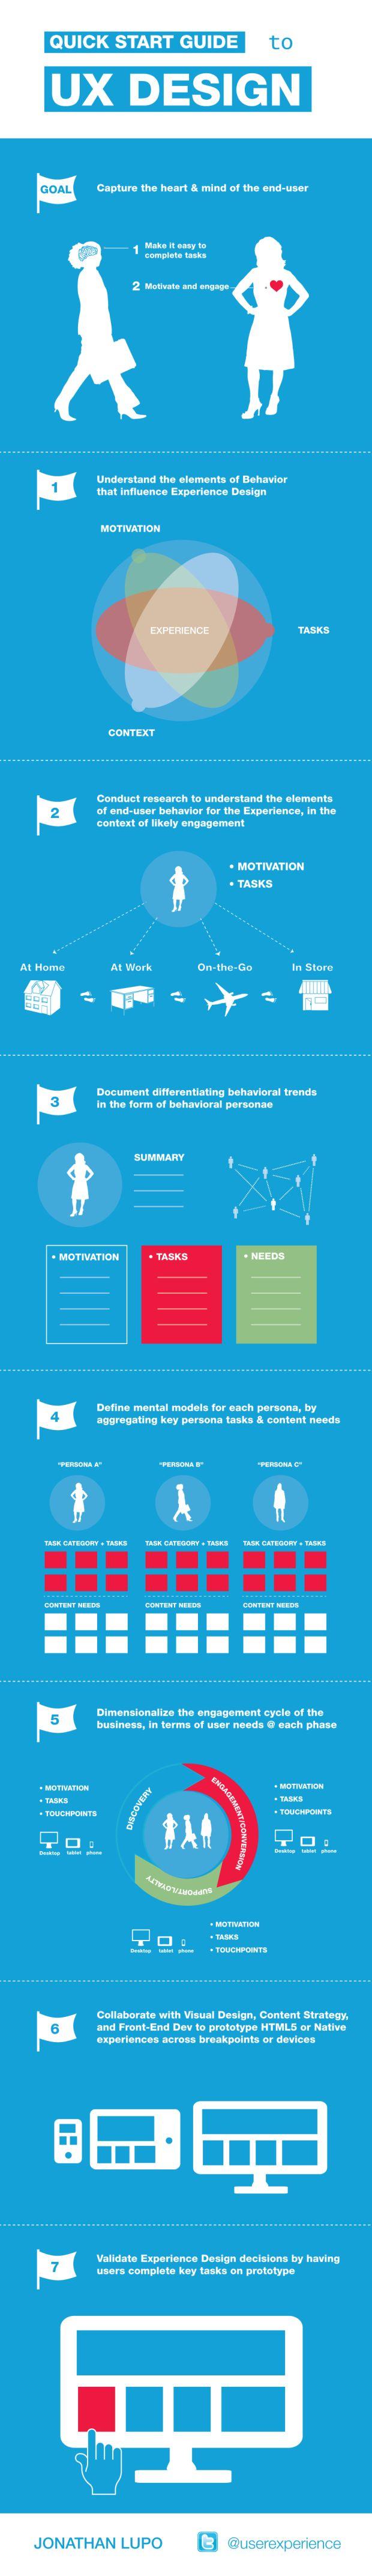 UX Design | Infographic